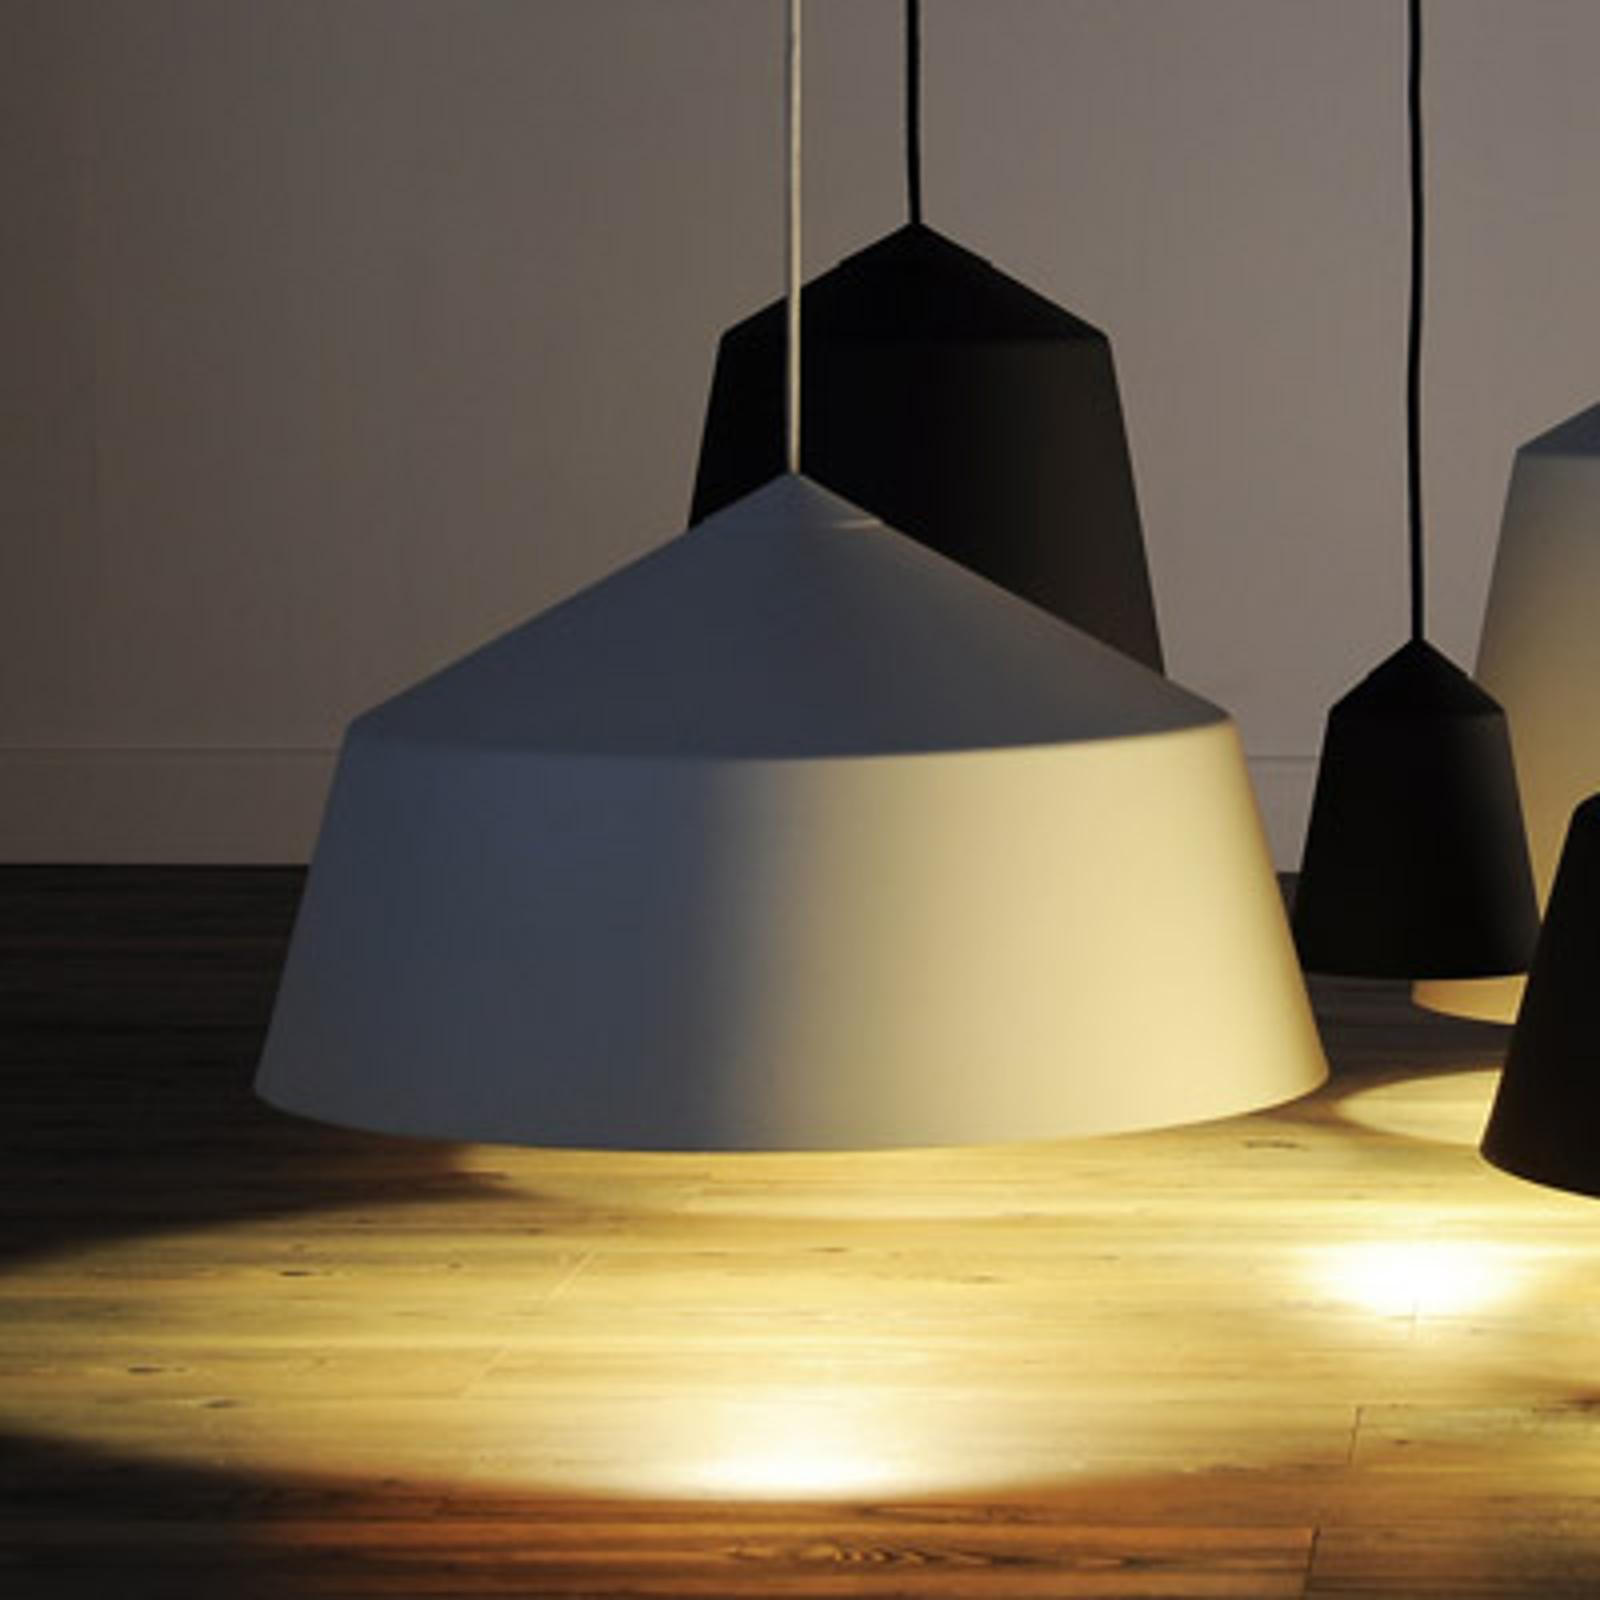 Produktové foto Innermost Innermost Circus závěsné světlo, bílá-zlatá, 56 cm